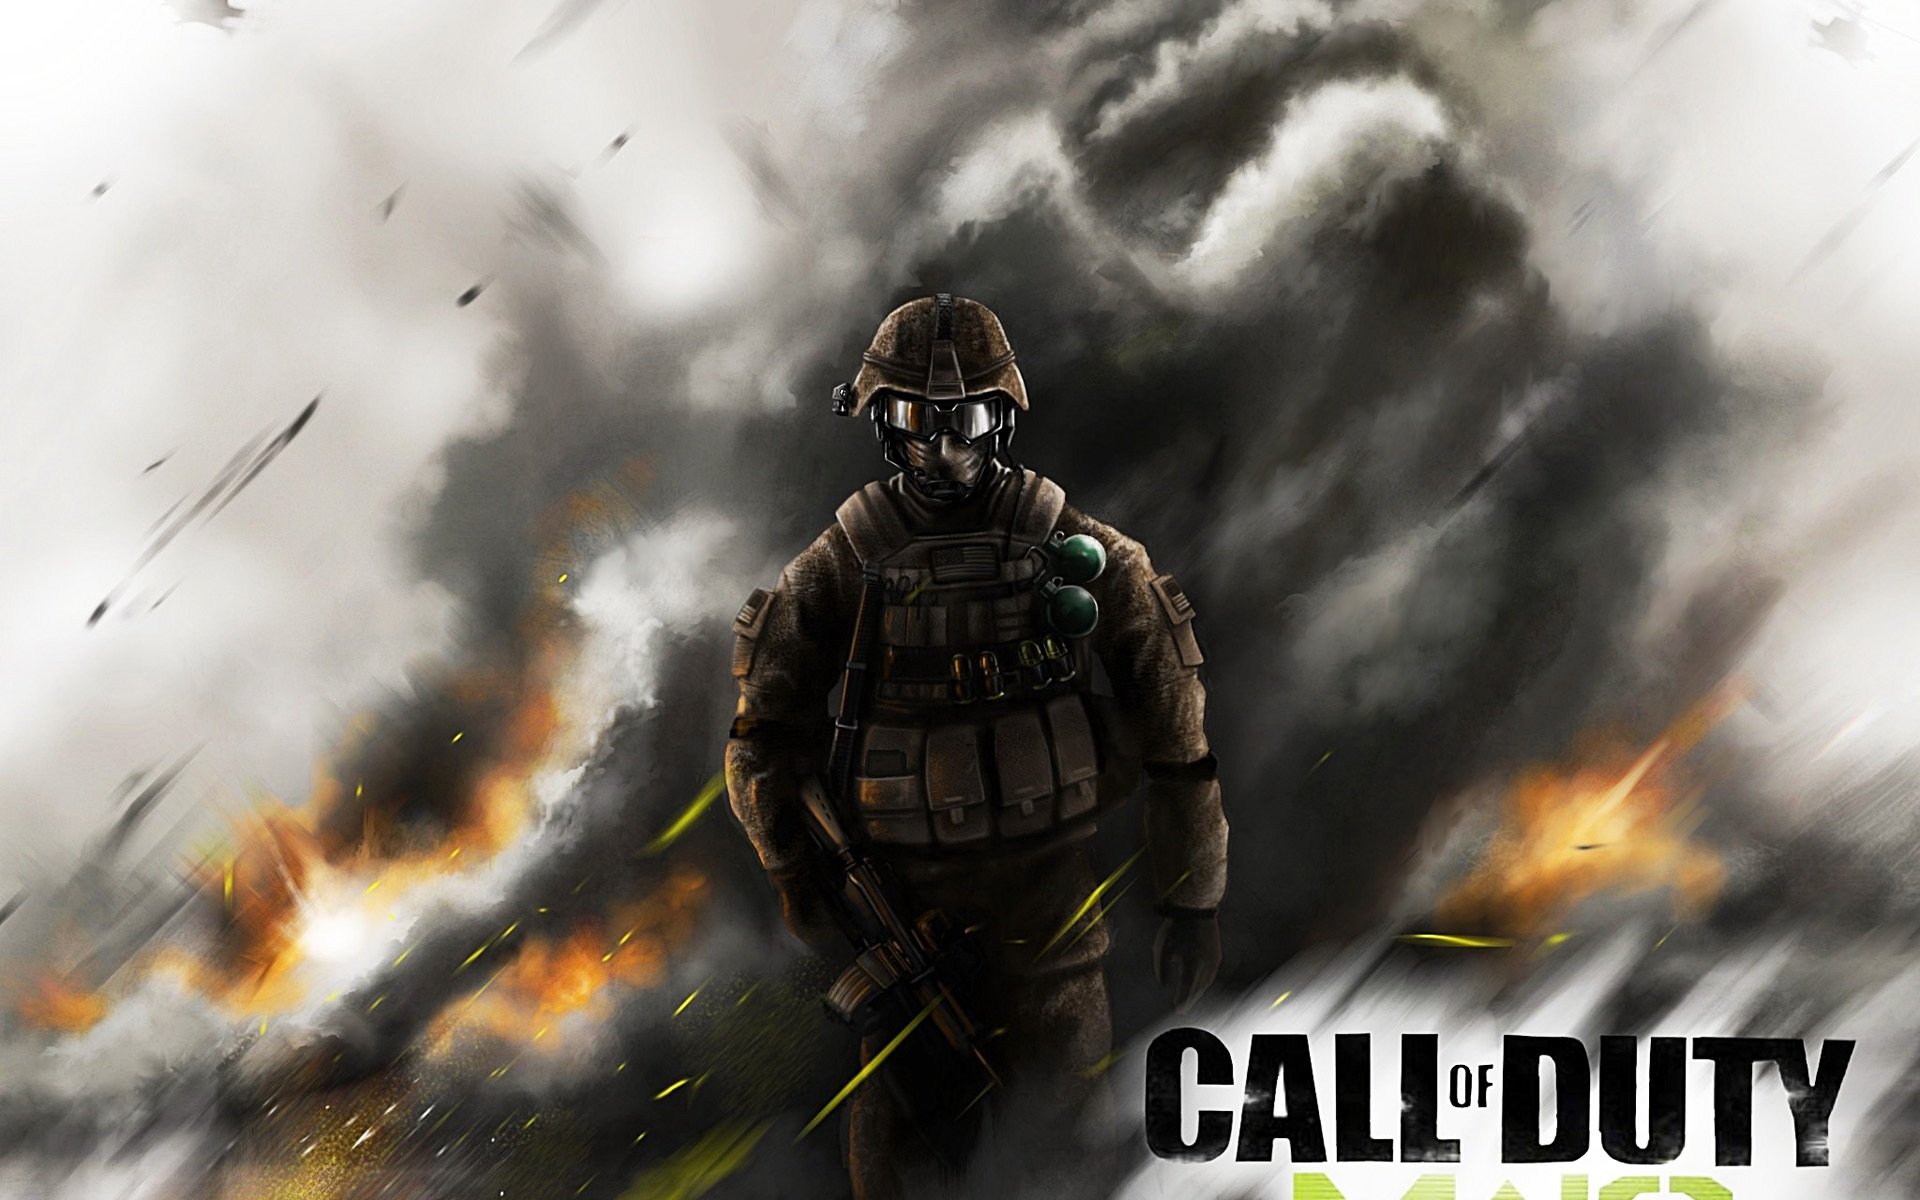 Wallpaper Pc Game Call Of Duty Modern Warfare 3 1920x1440 Hd